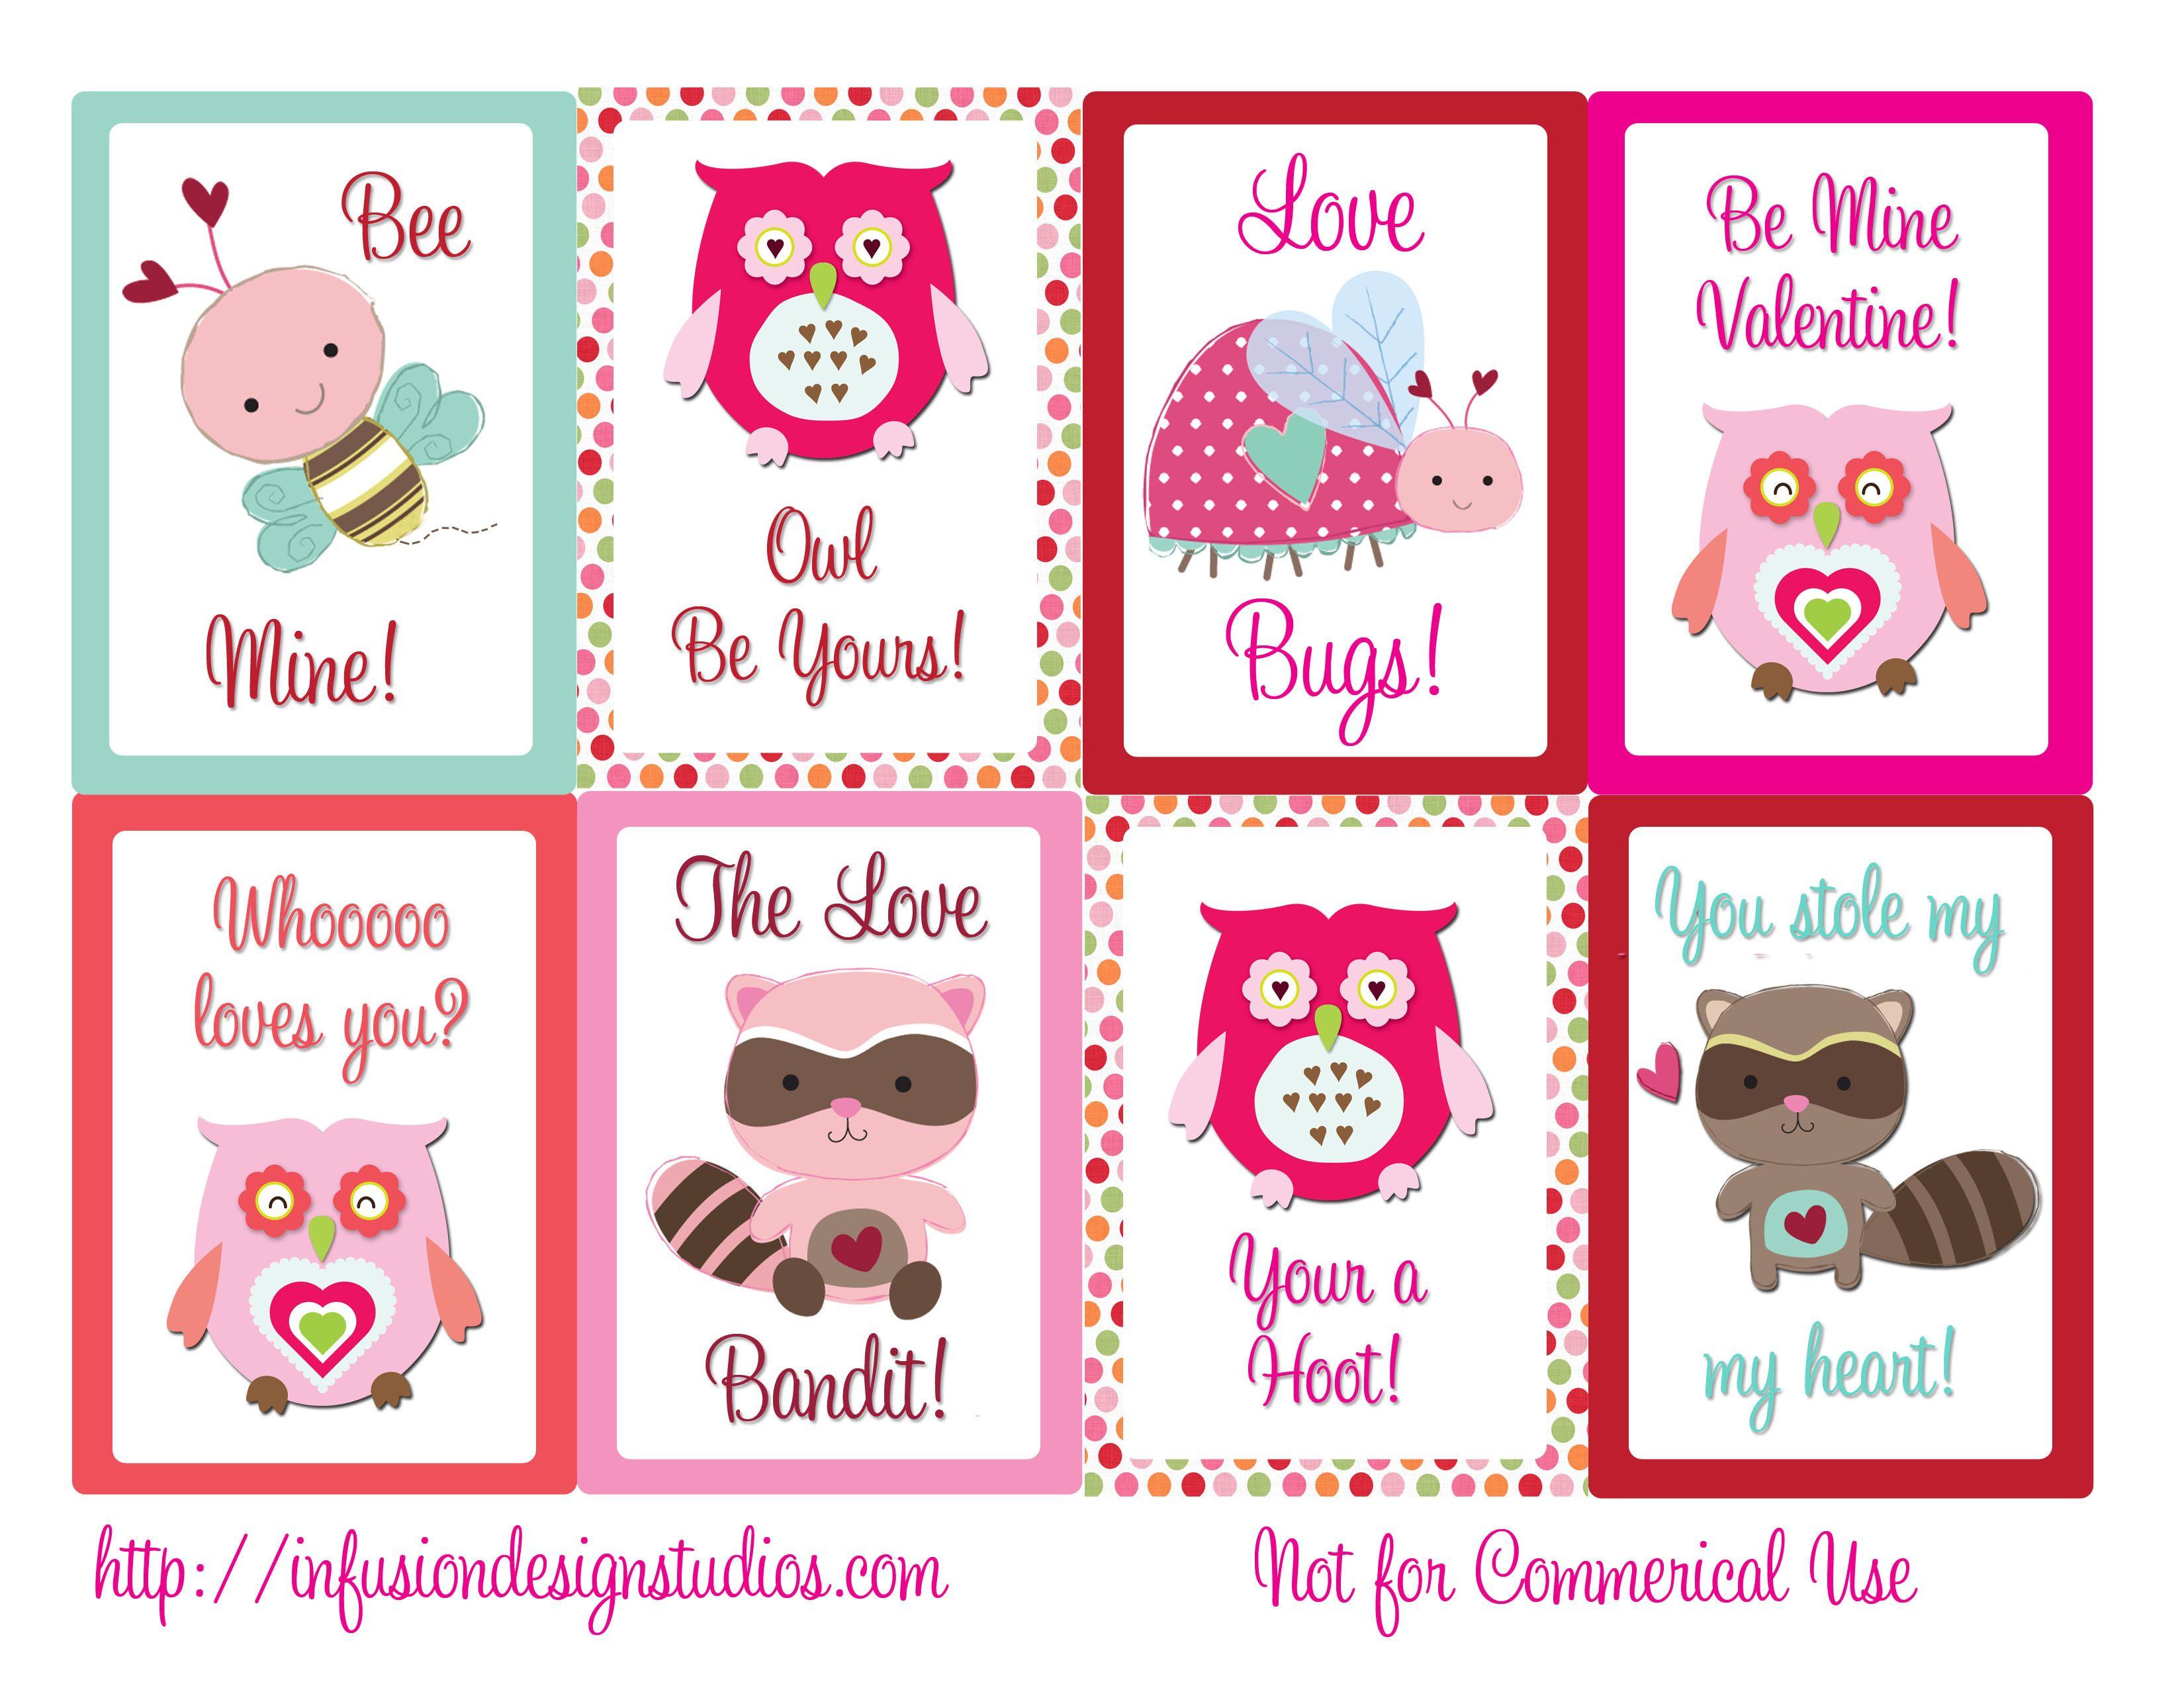 Free Printable Valentines Cards Children. If You Want These - Free Printable Valentine Cards For Preschoolers